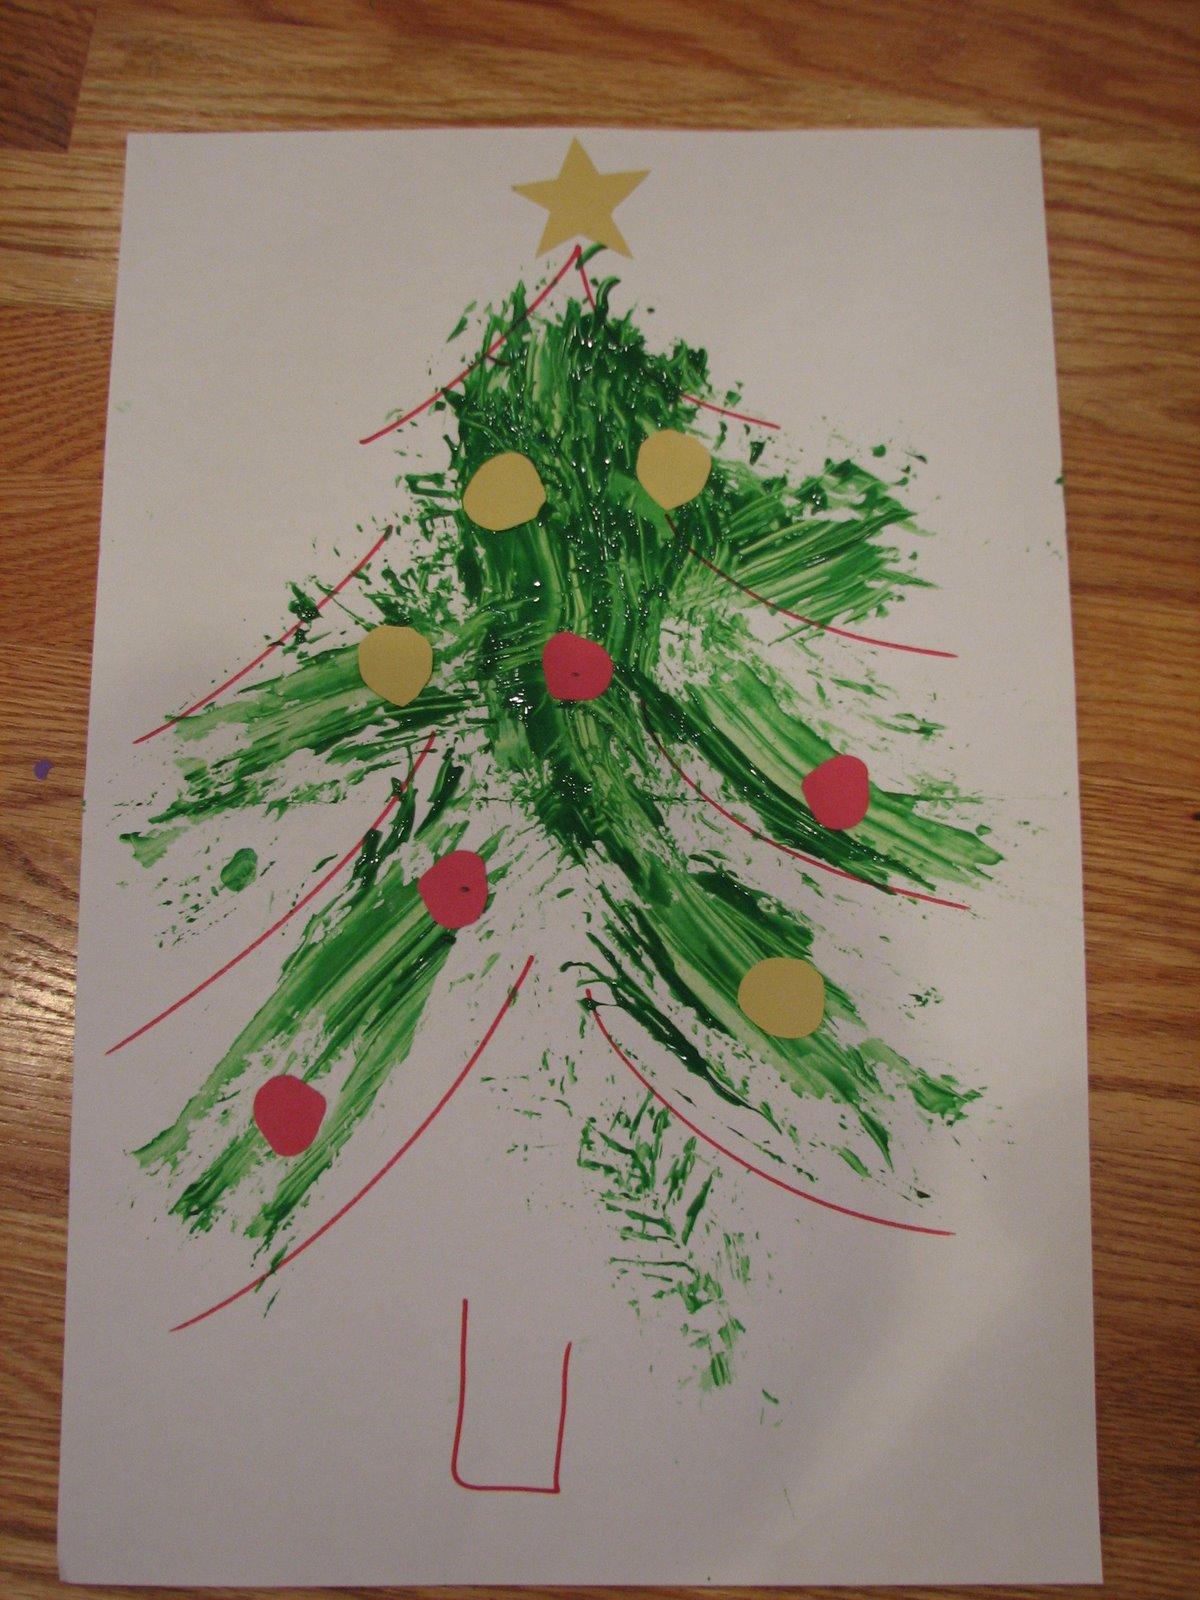 Budgetadvice And Everything Nice Christmas Crafts Super Easy Inexpensive To Do